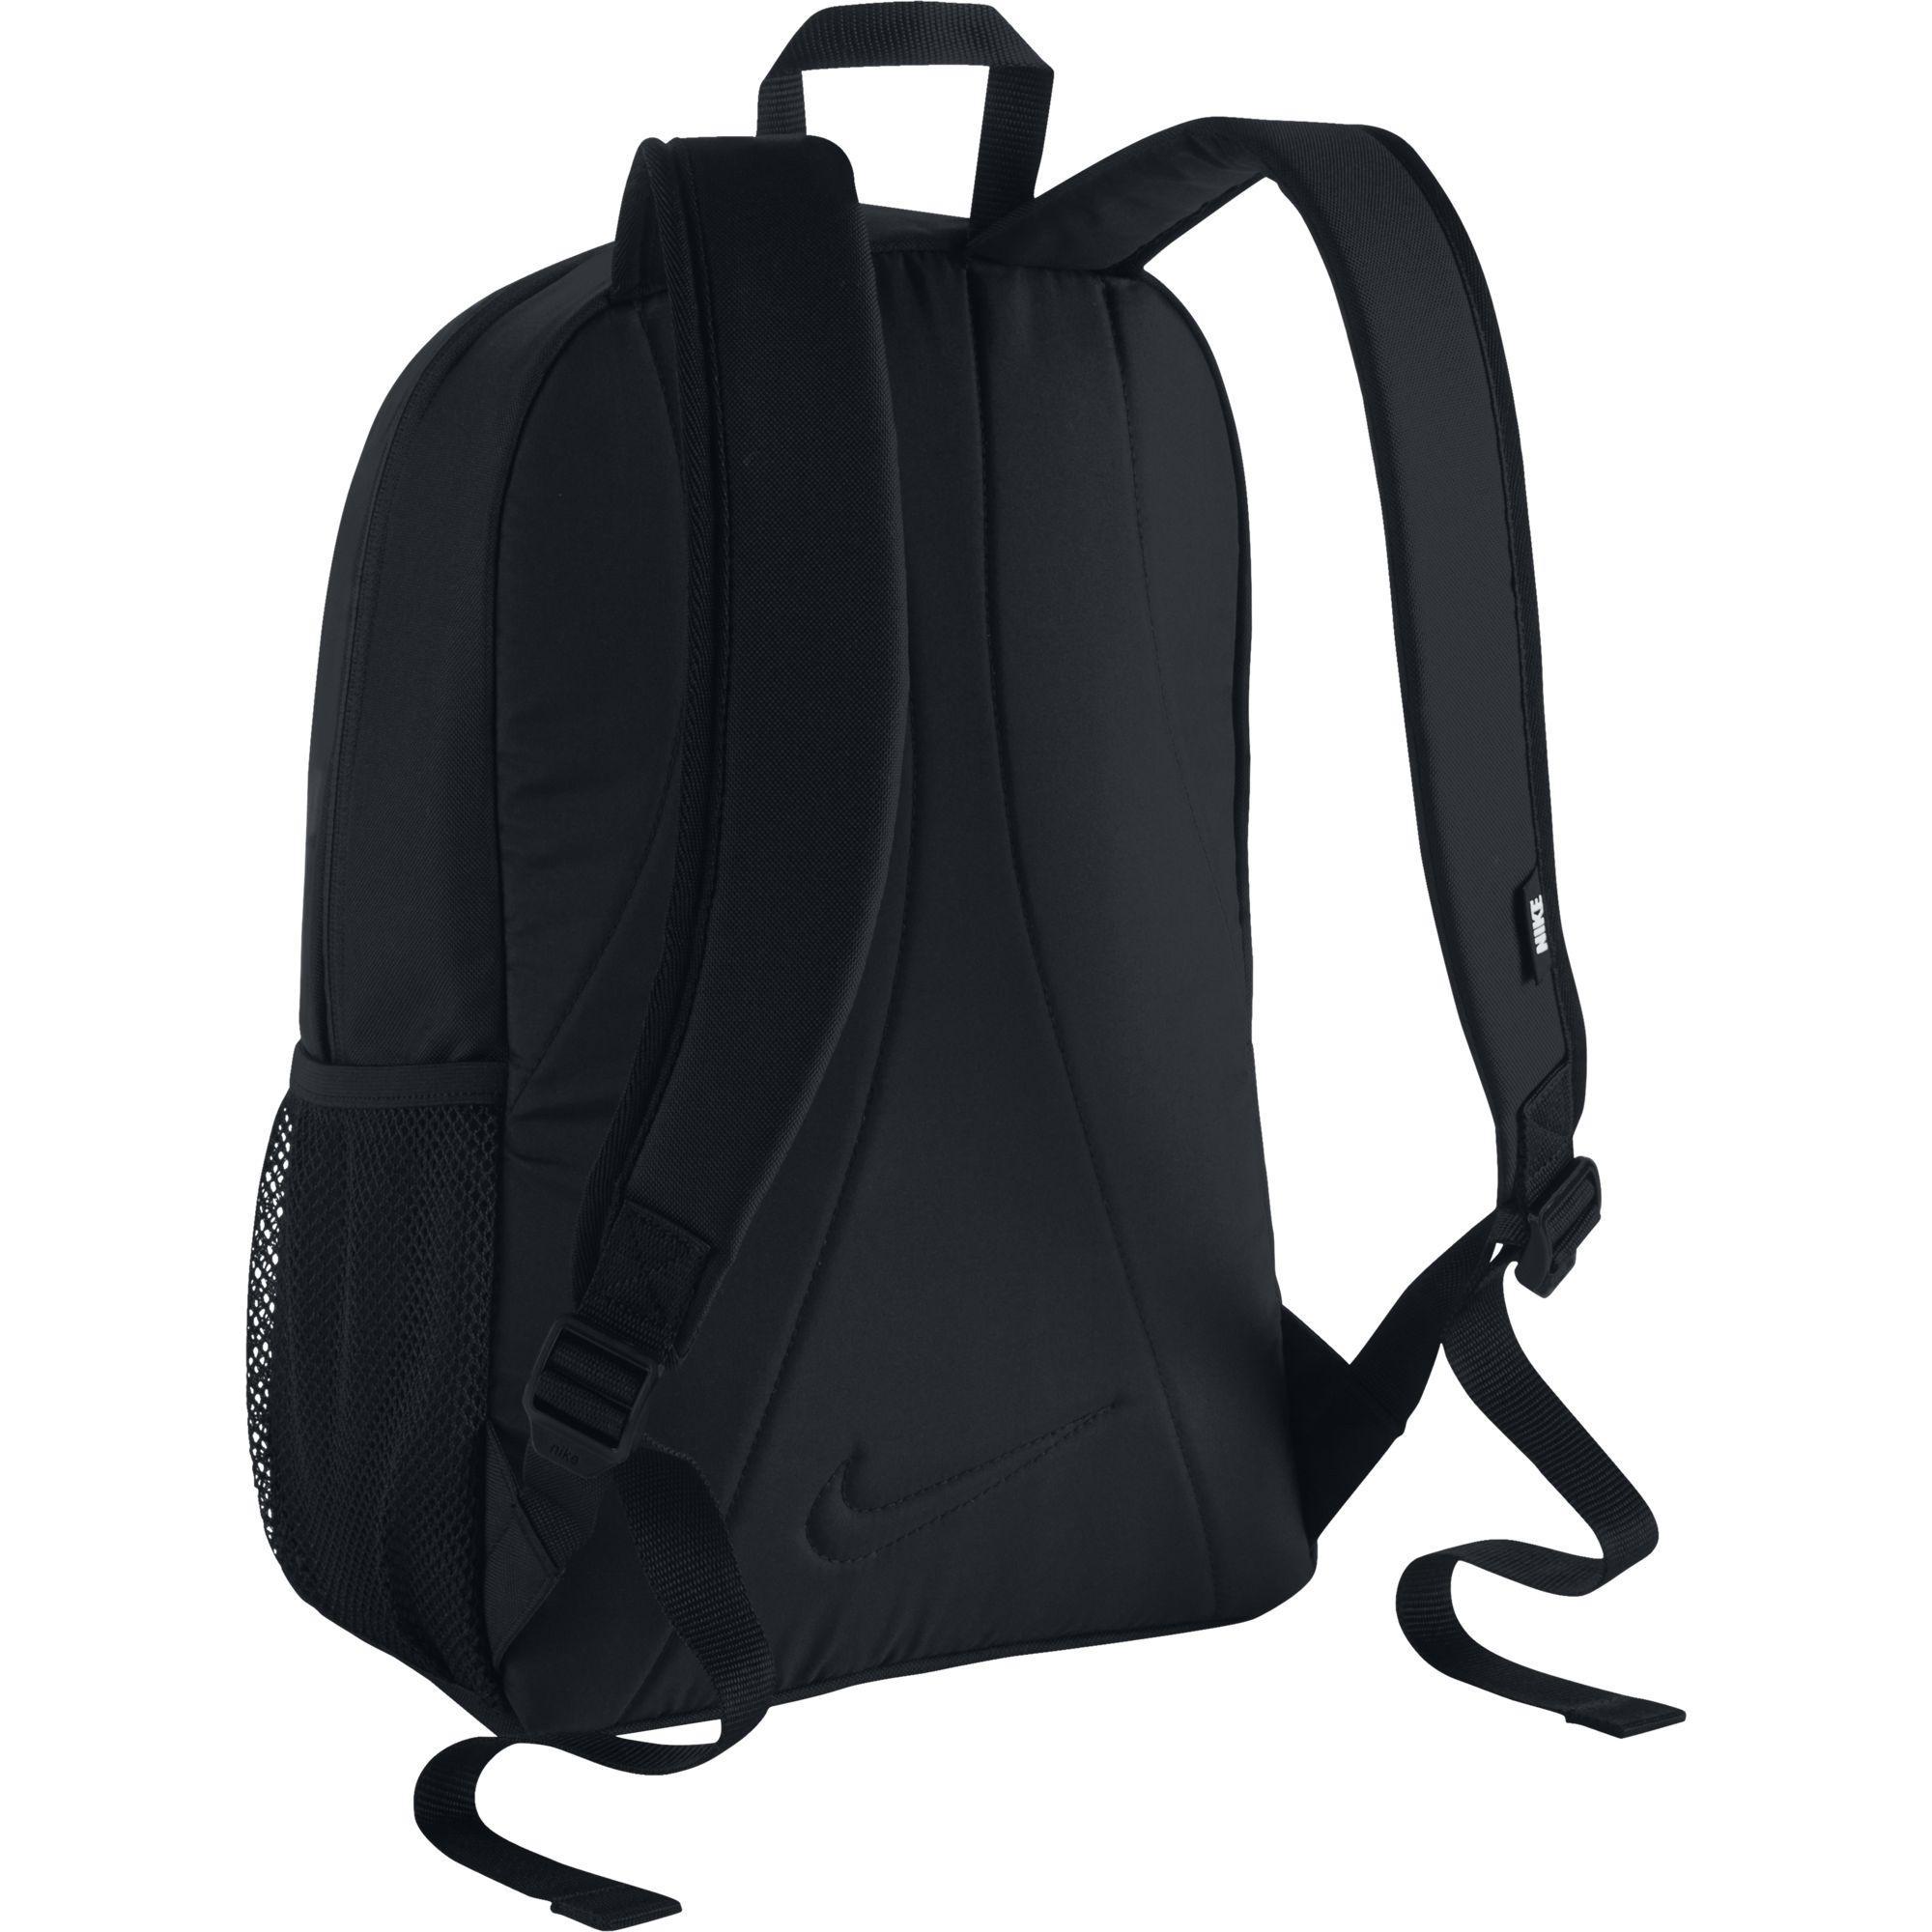 Nike Classic Sand Backpack - Black - Tennisnuts.com fbdd95251aaf6